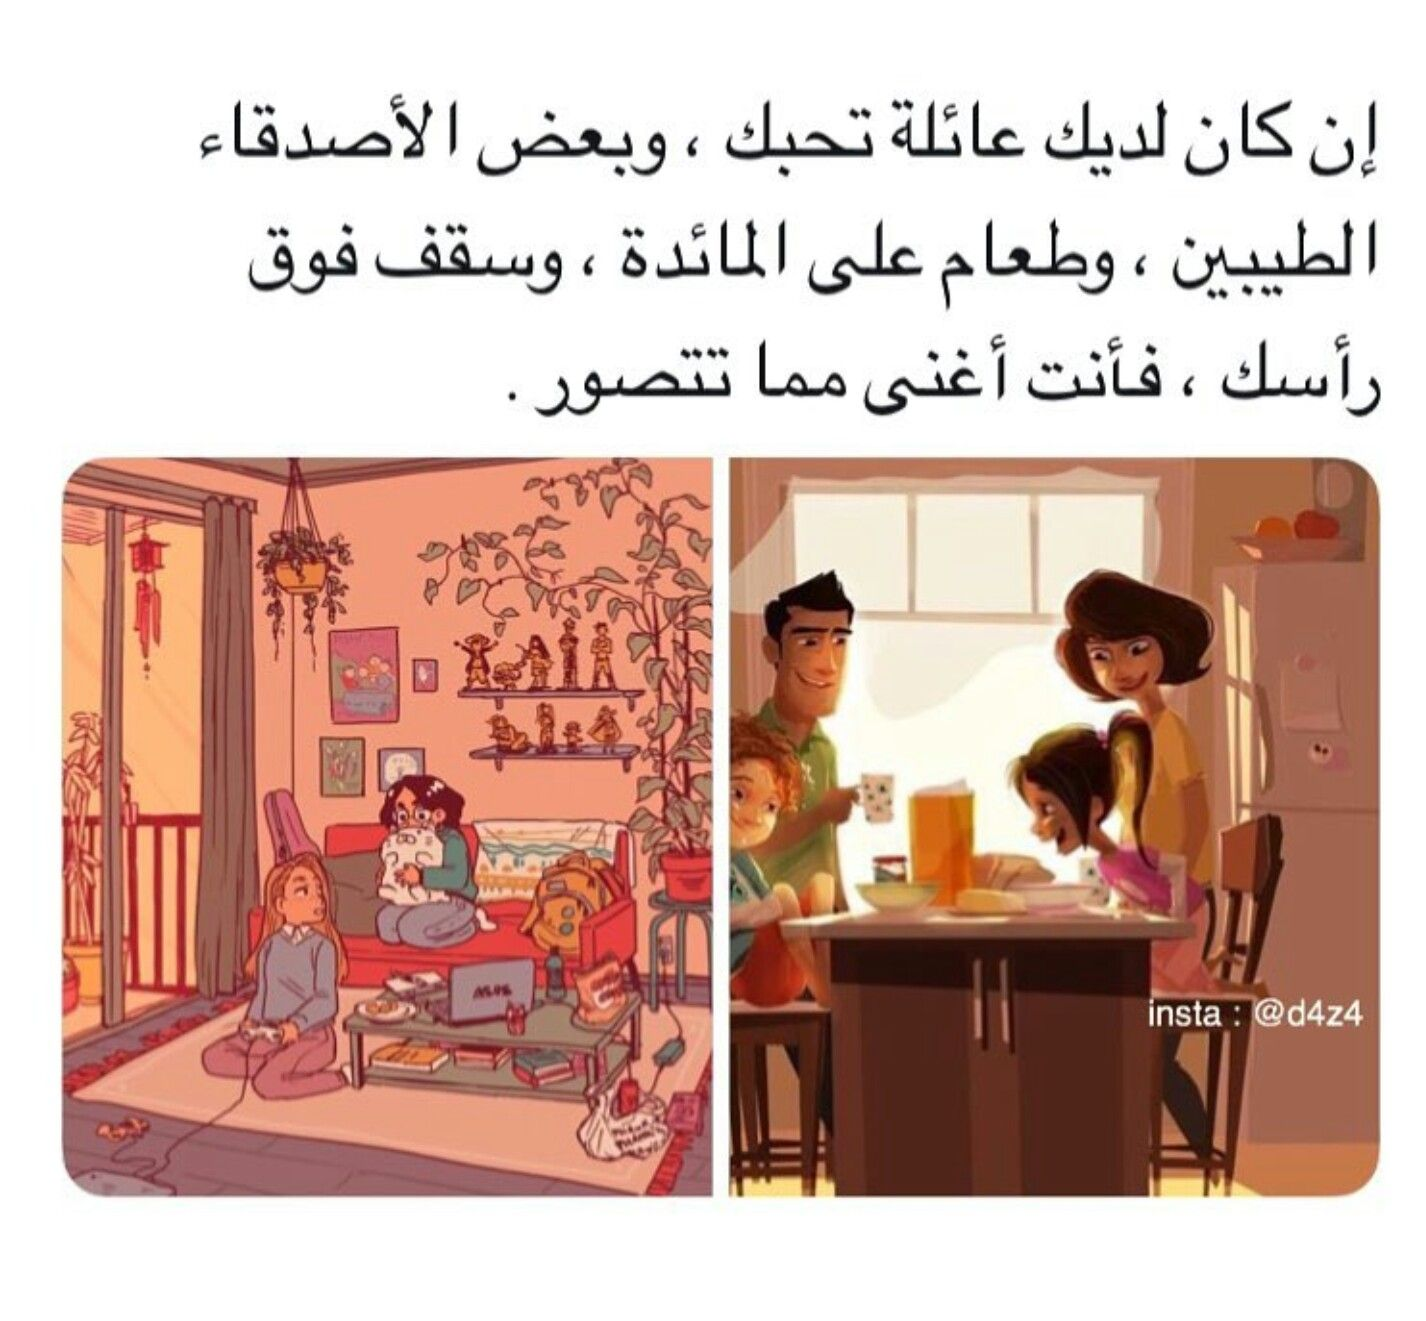 الحمدلله حمدا تستديم به النعم Life Quotes Pictures Picture Quotes Sweet Words